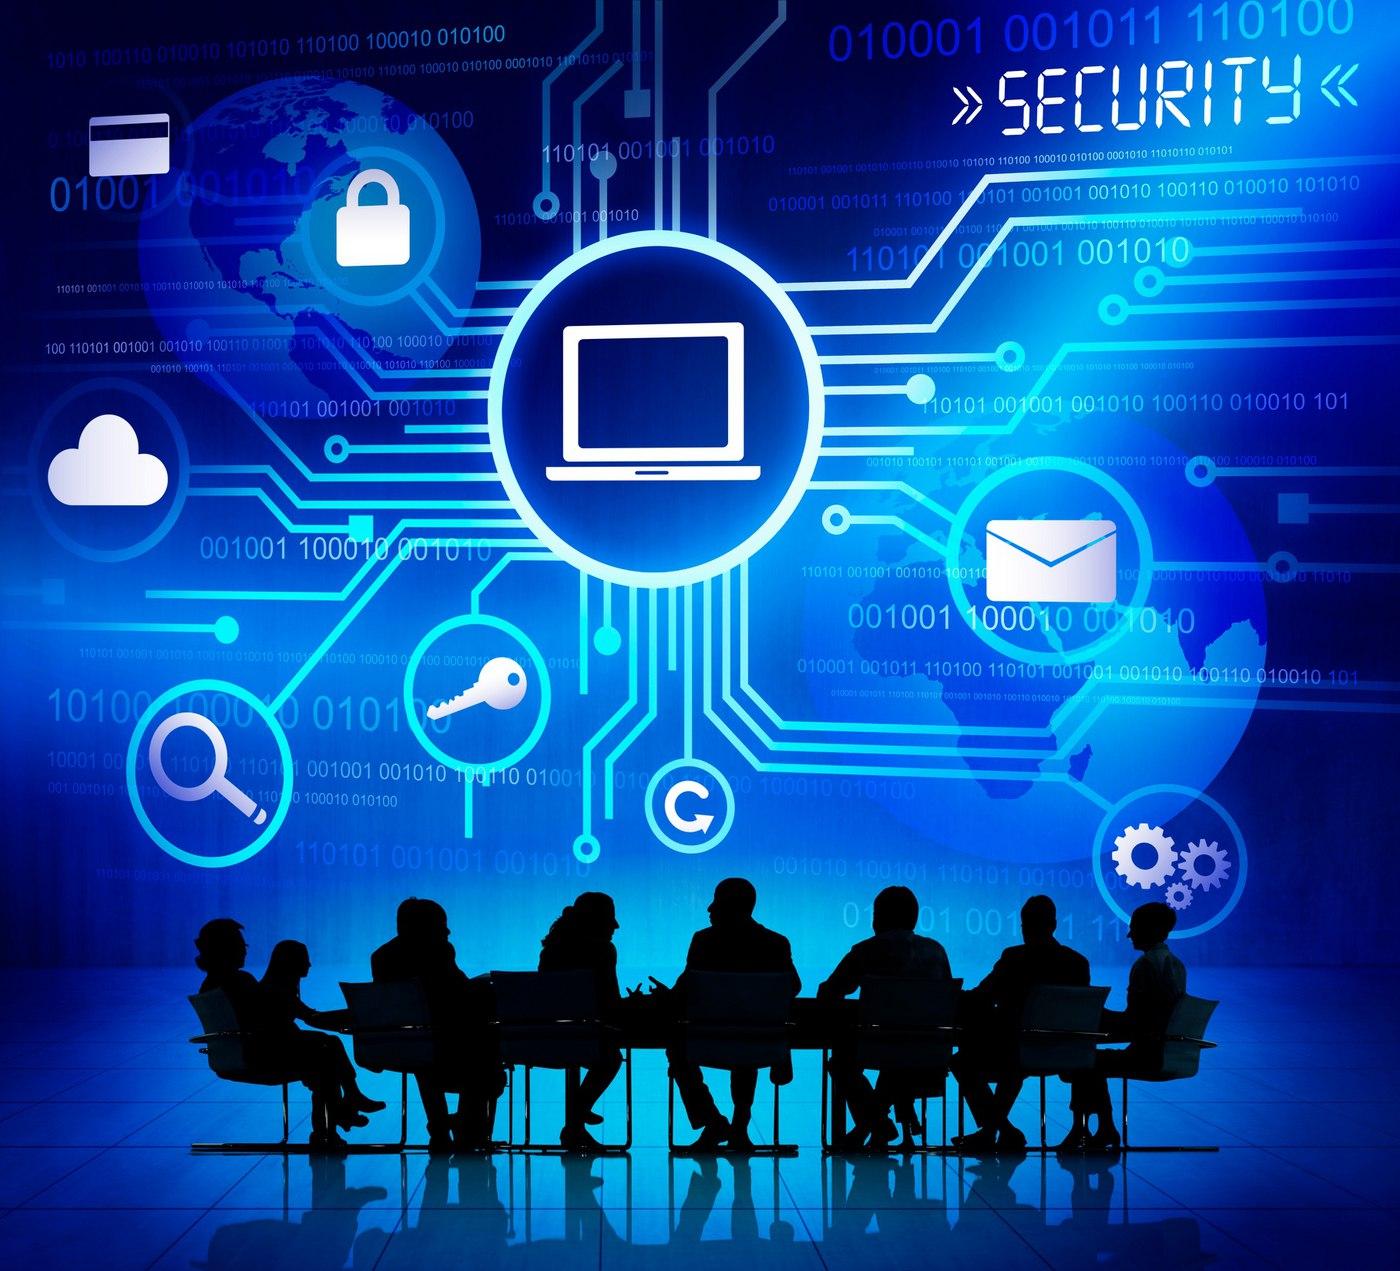 enterprise_cybersecurity.jpg